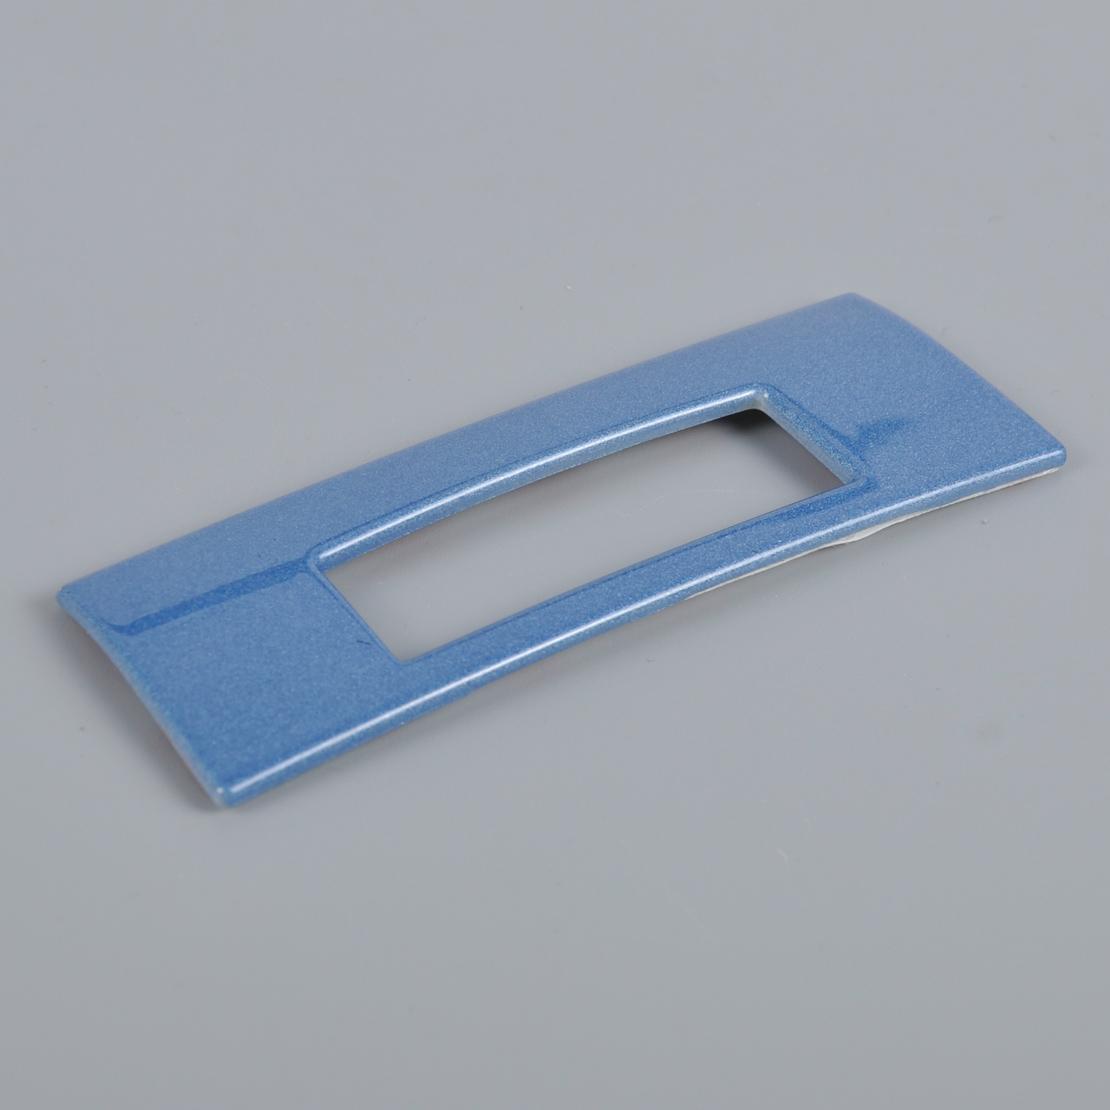 for chevrolet cruze car auto interior center console protective trim stickers ebay. Black Bedroom Furniture Sets. Home Design Ideas